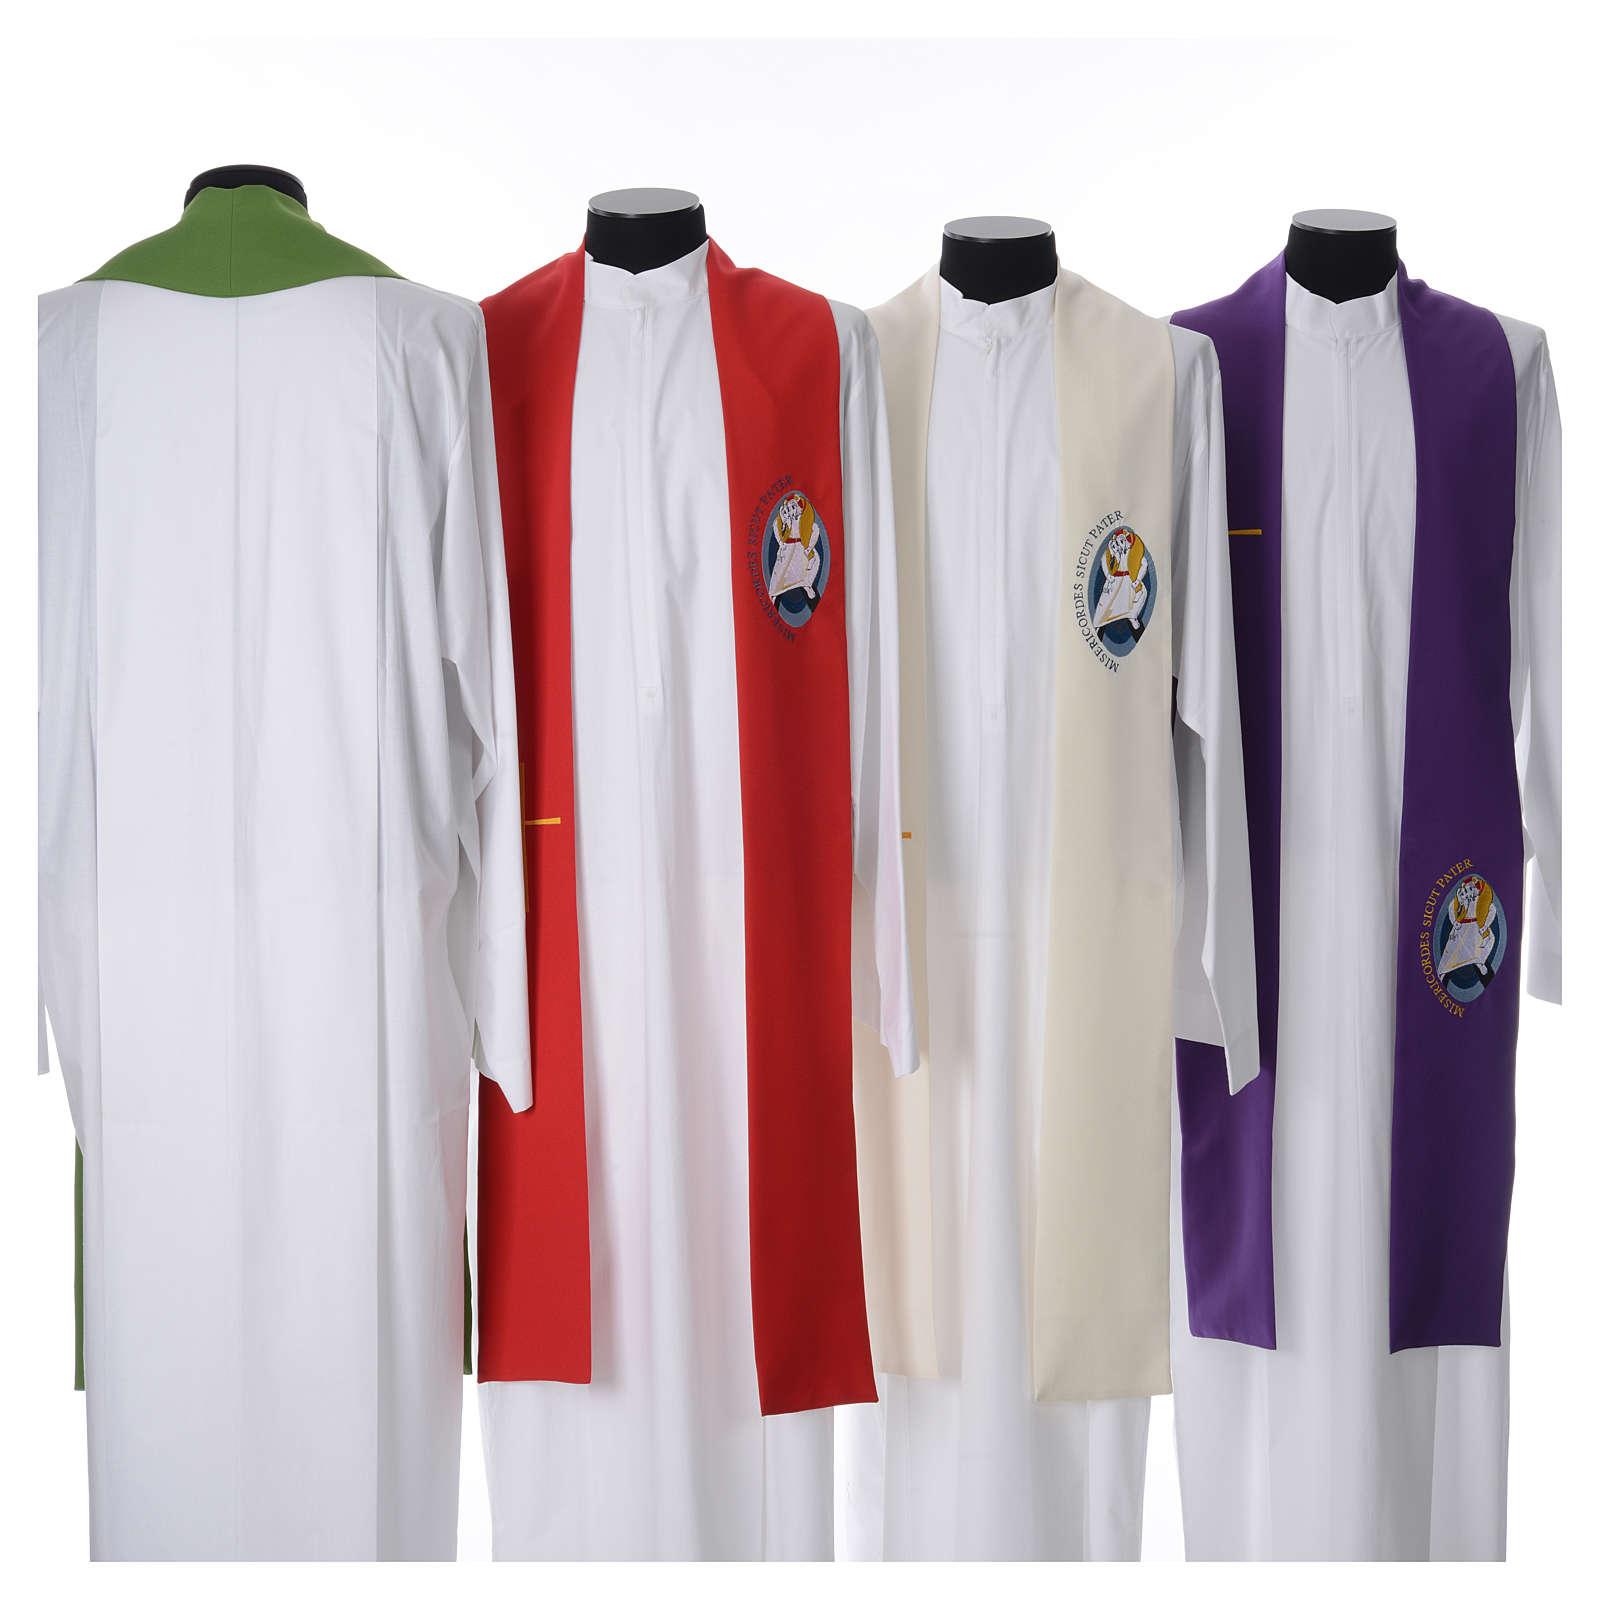 STOCK Stola Giubileo della Misericordia 100% poliestere 4